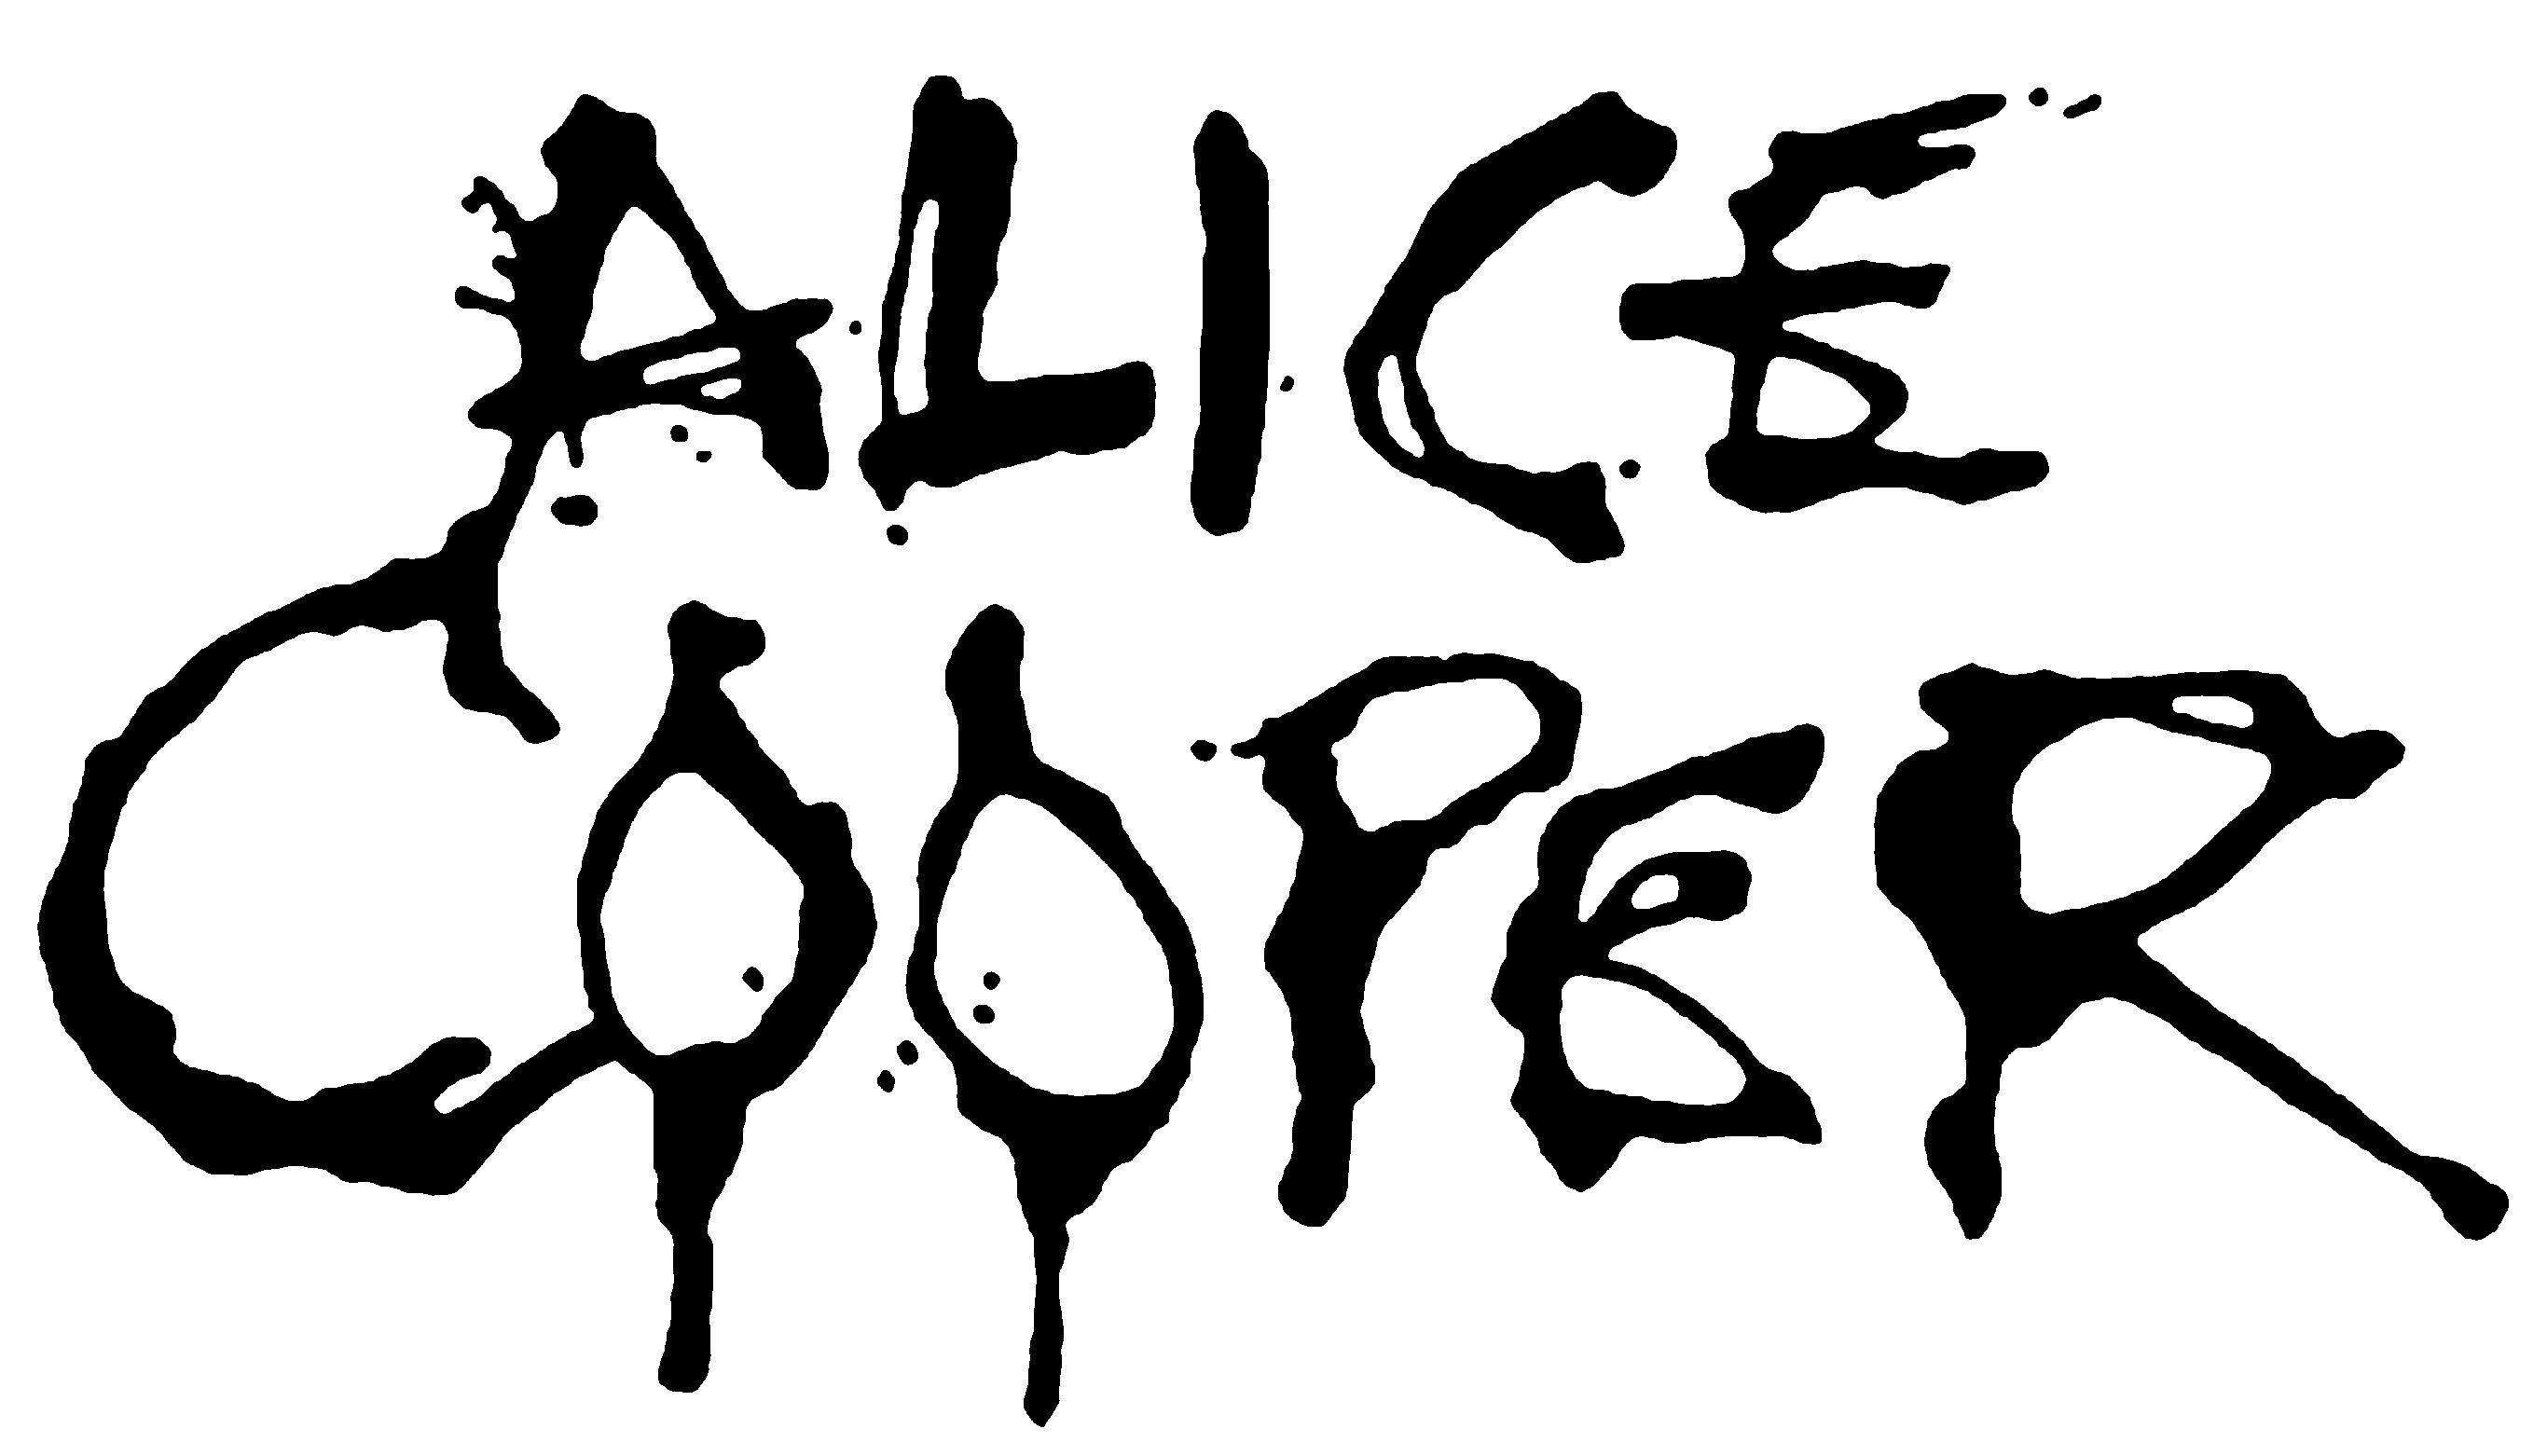 ALICE COOPER ANNOUNCES 2018 NORTH AMERICAN TOUR DATES